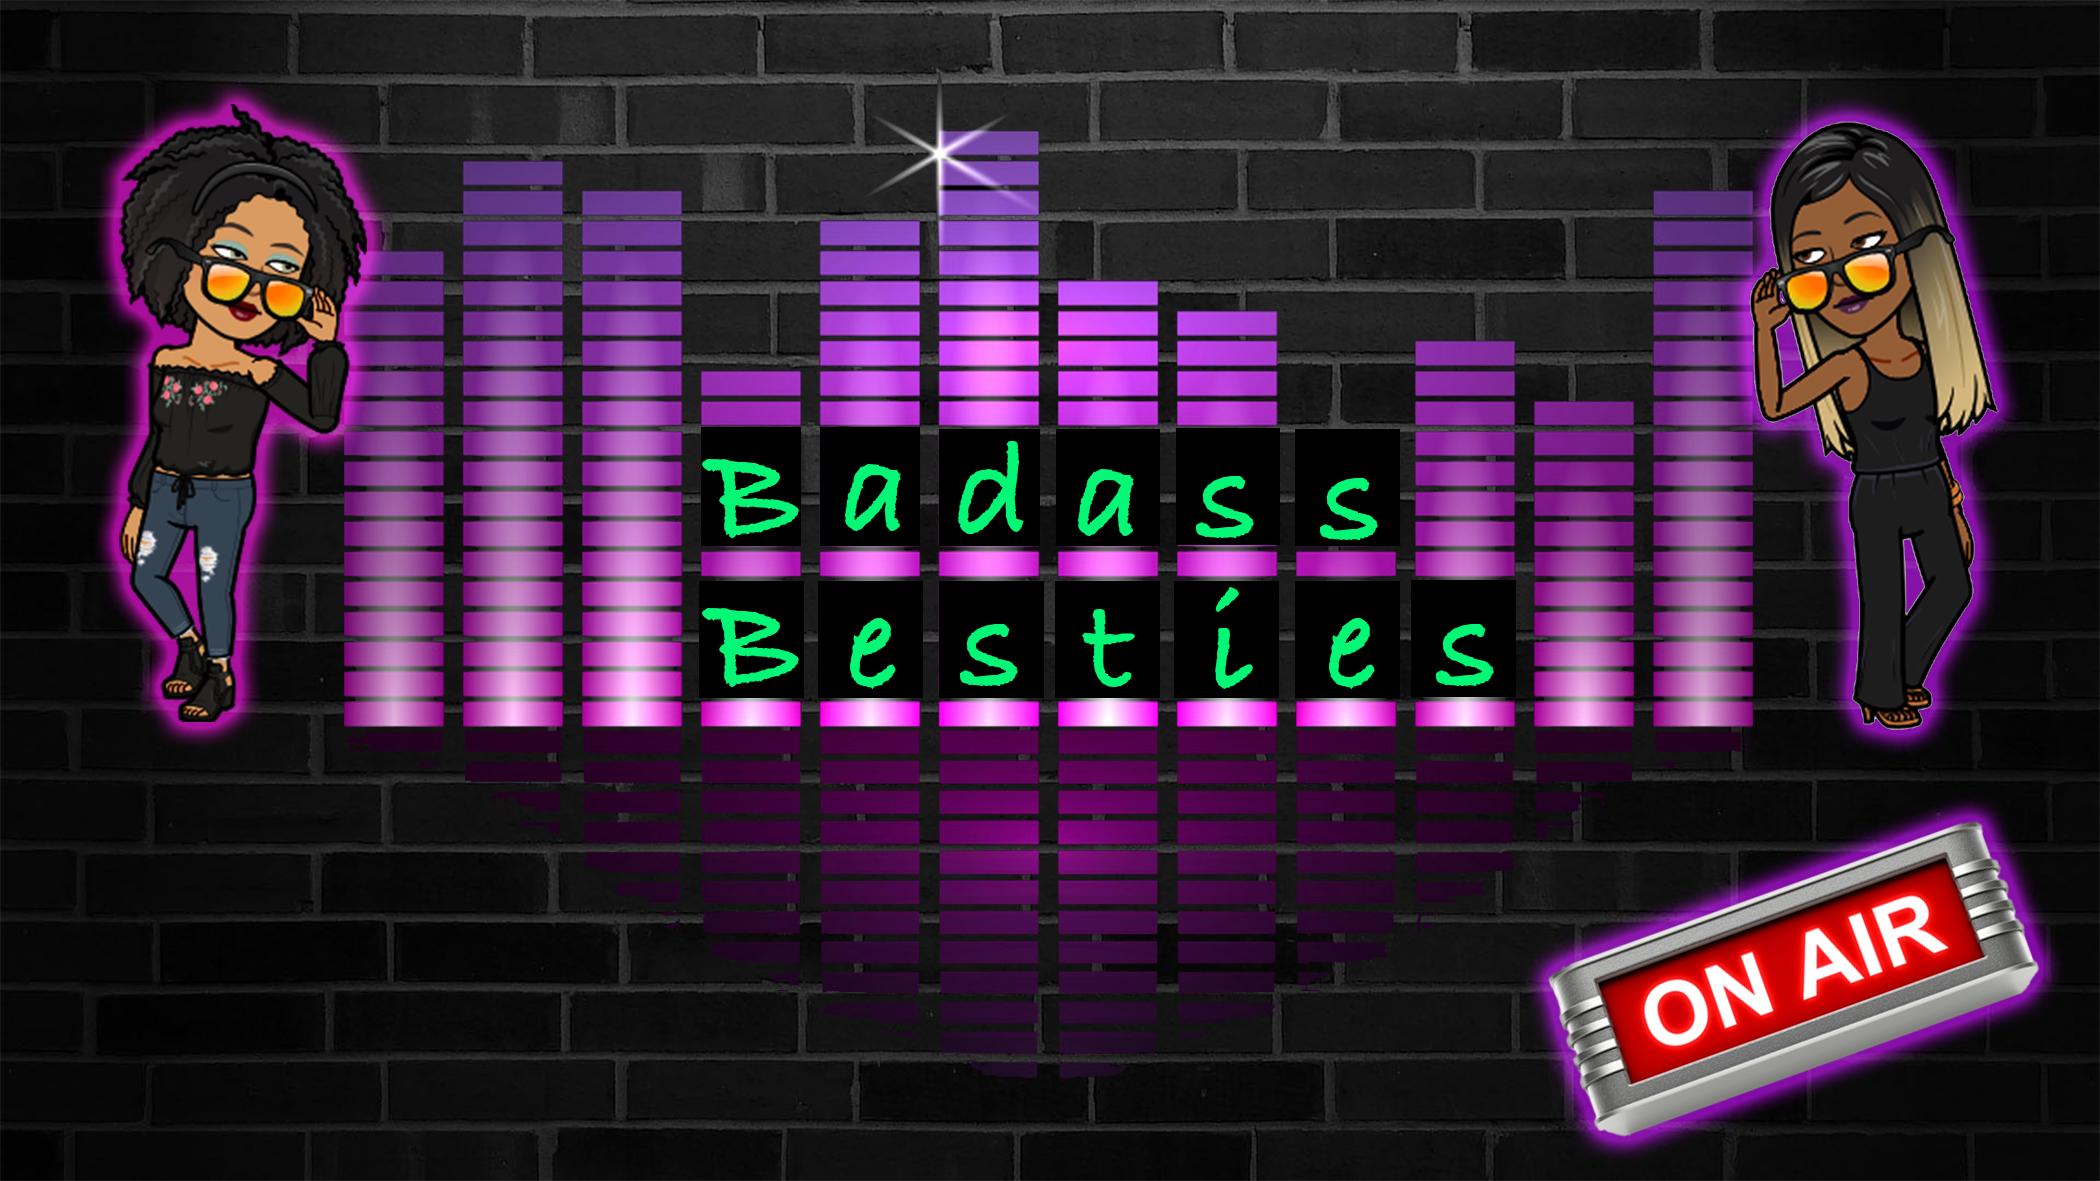 Badass Besties